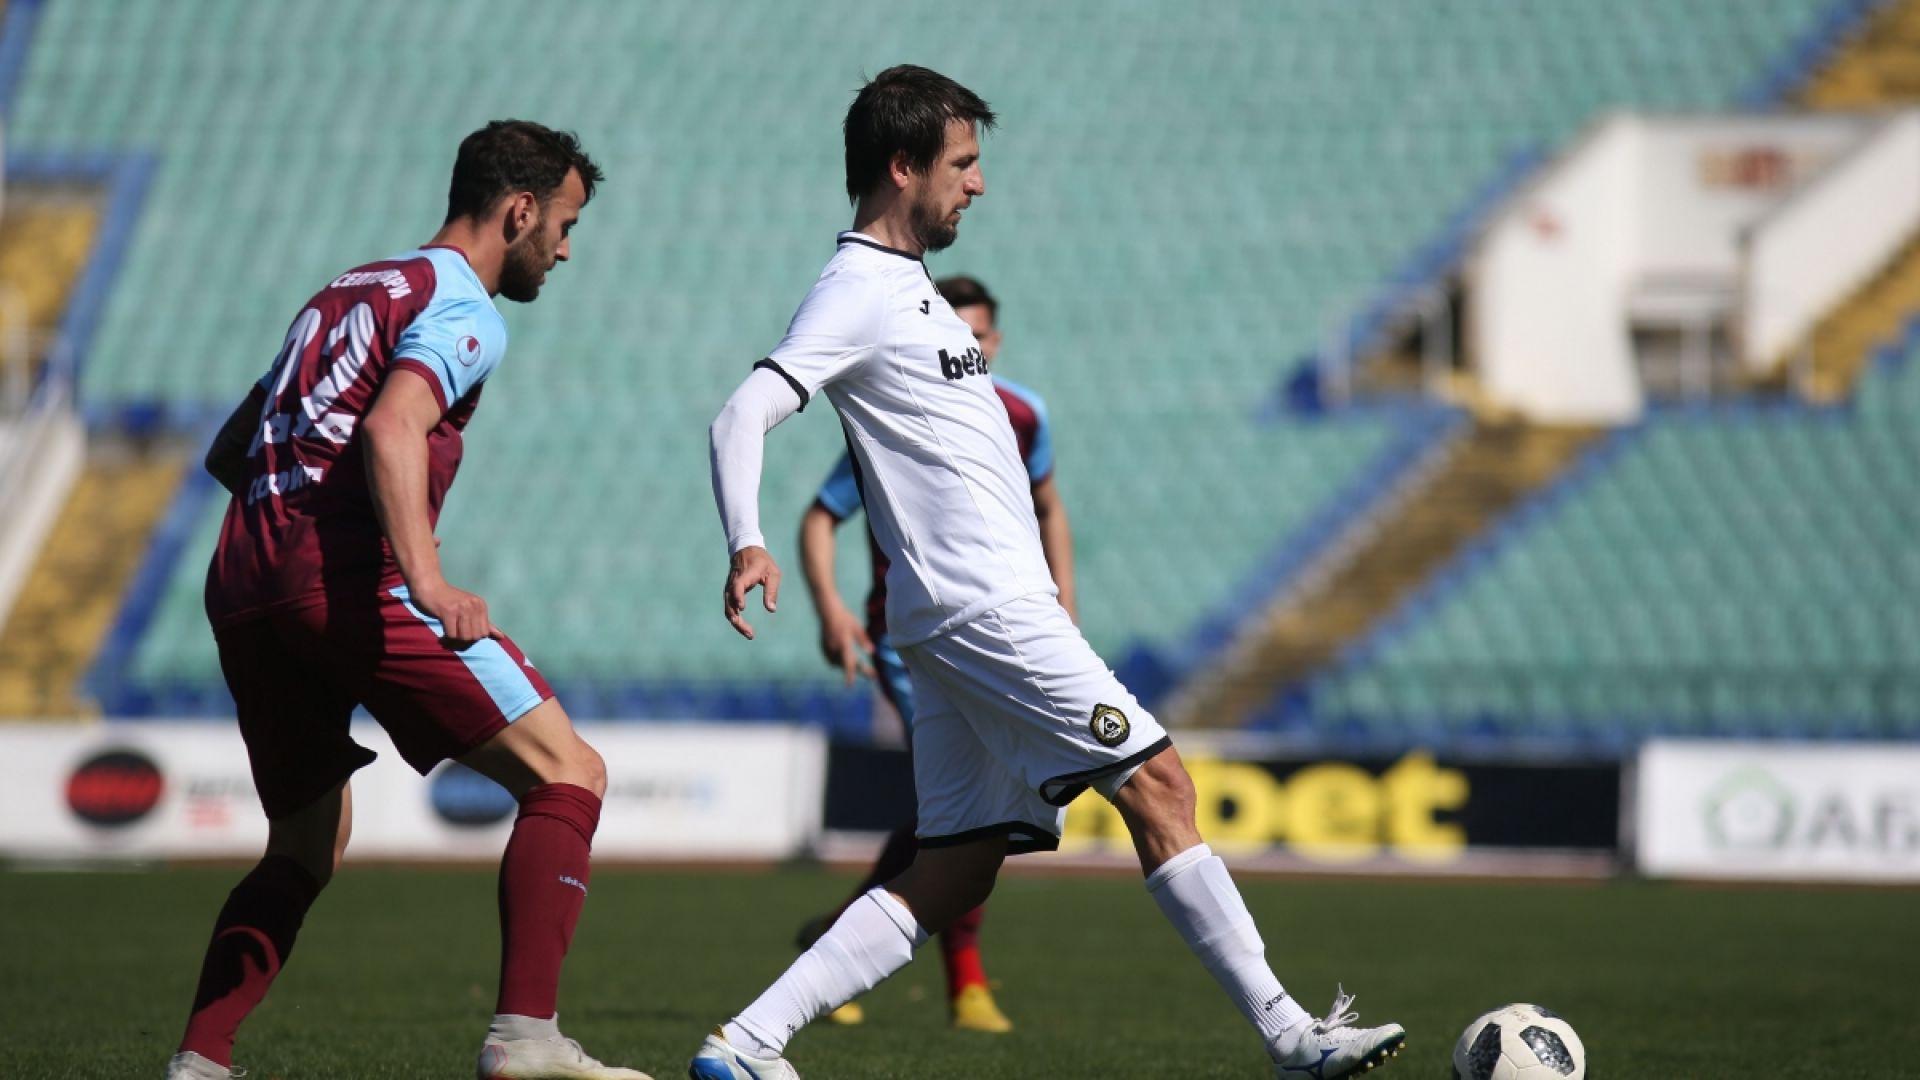 Дебютен гол на Тасевски донесе трудна победа за Славия